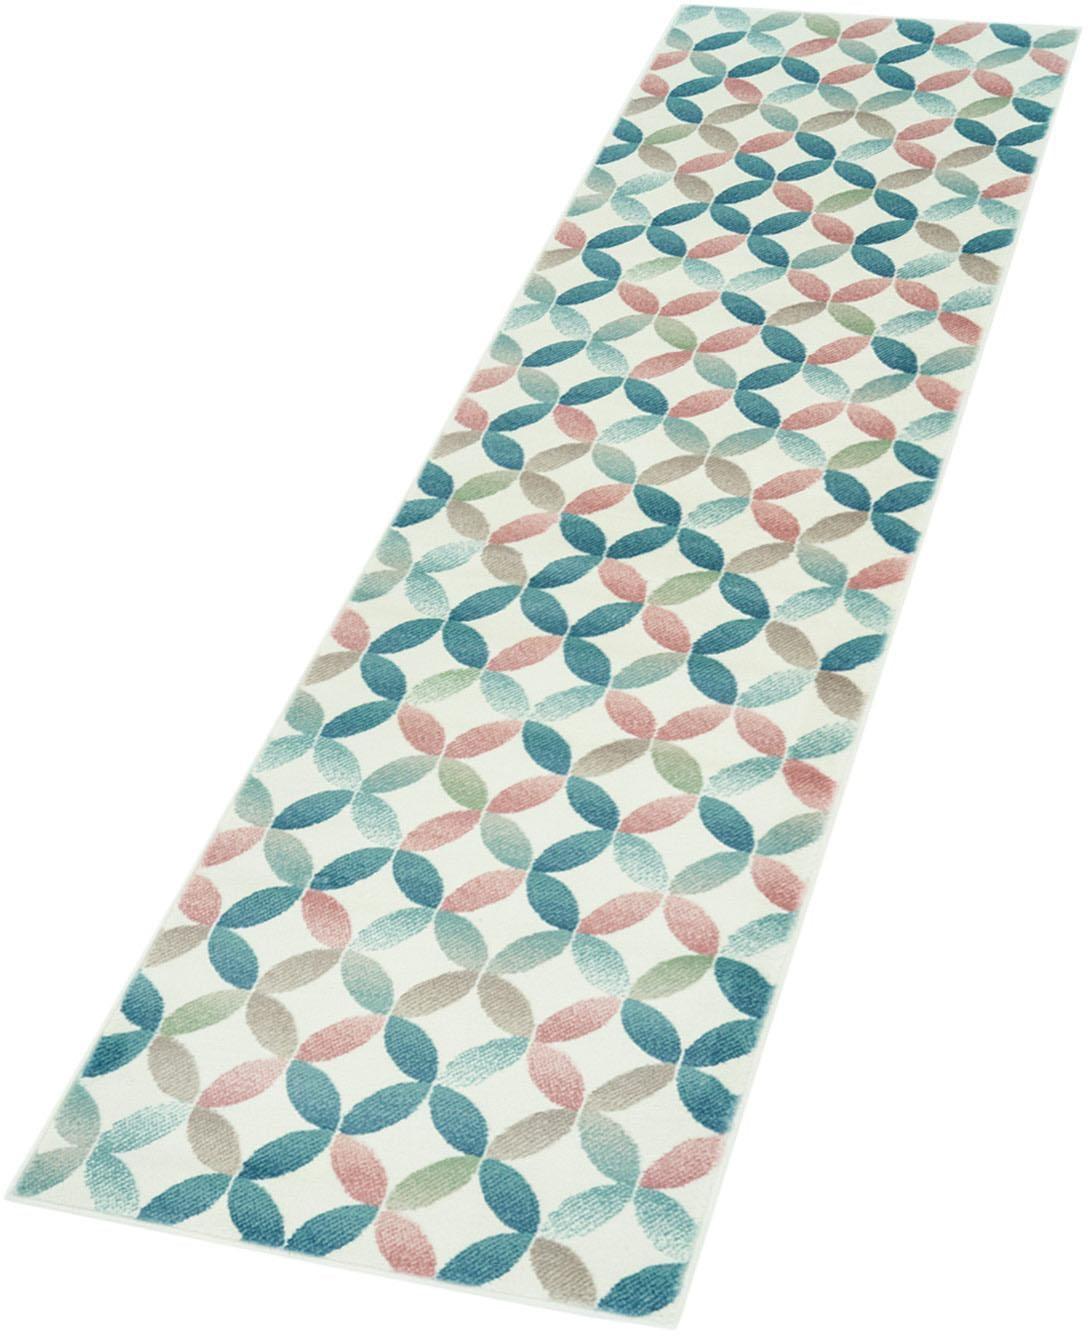 Läufer Inspiration 5787 Carpet City rechteckig Höhe 11 mm maschinell zusammengesetzt